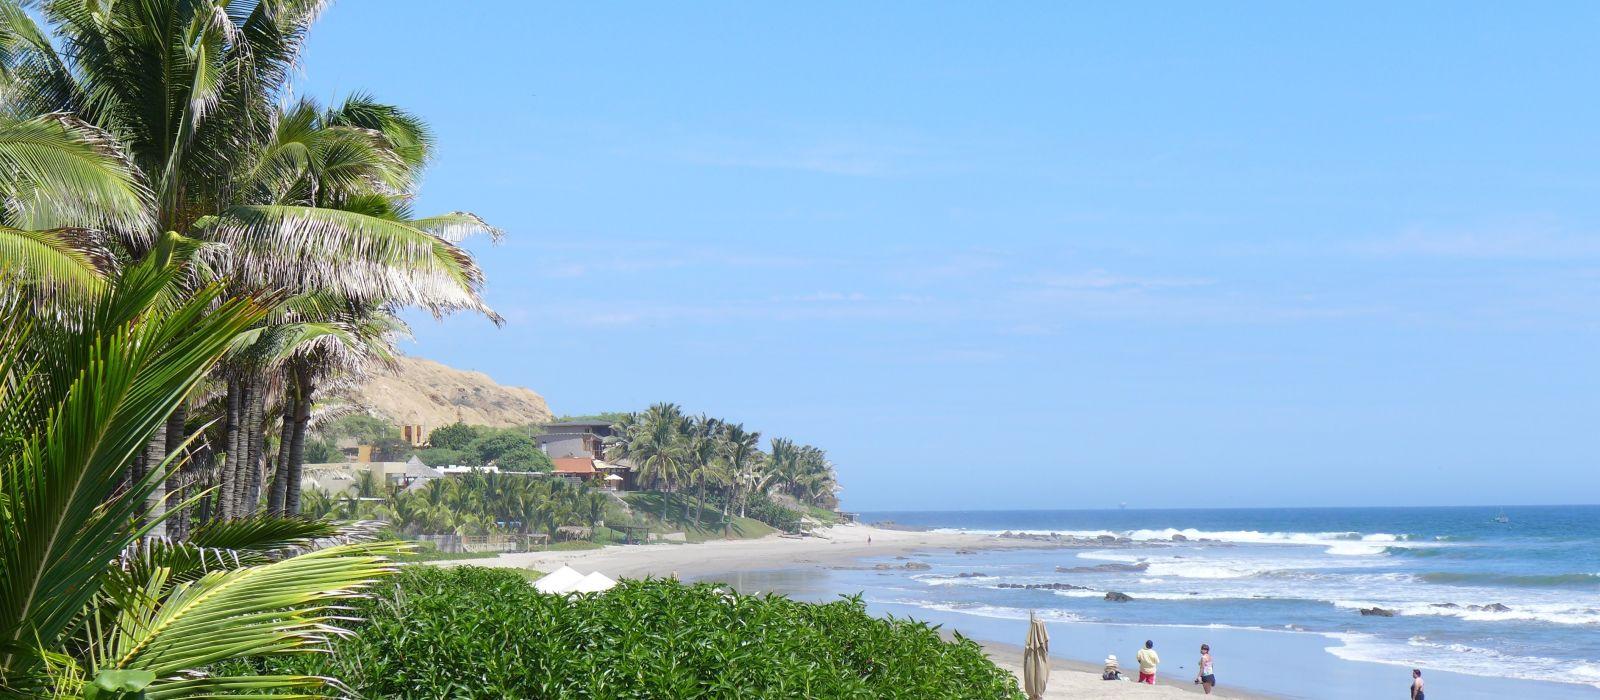 Peru: Machu Picchu and Beach Bliss Tour Trip 5